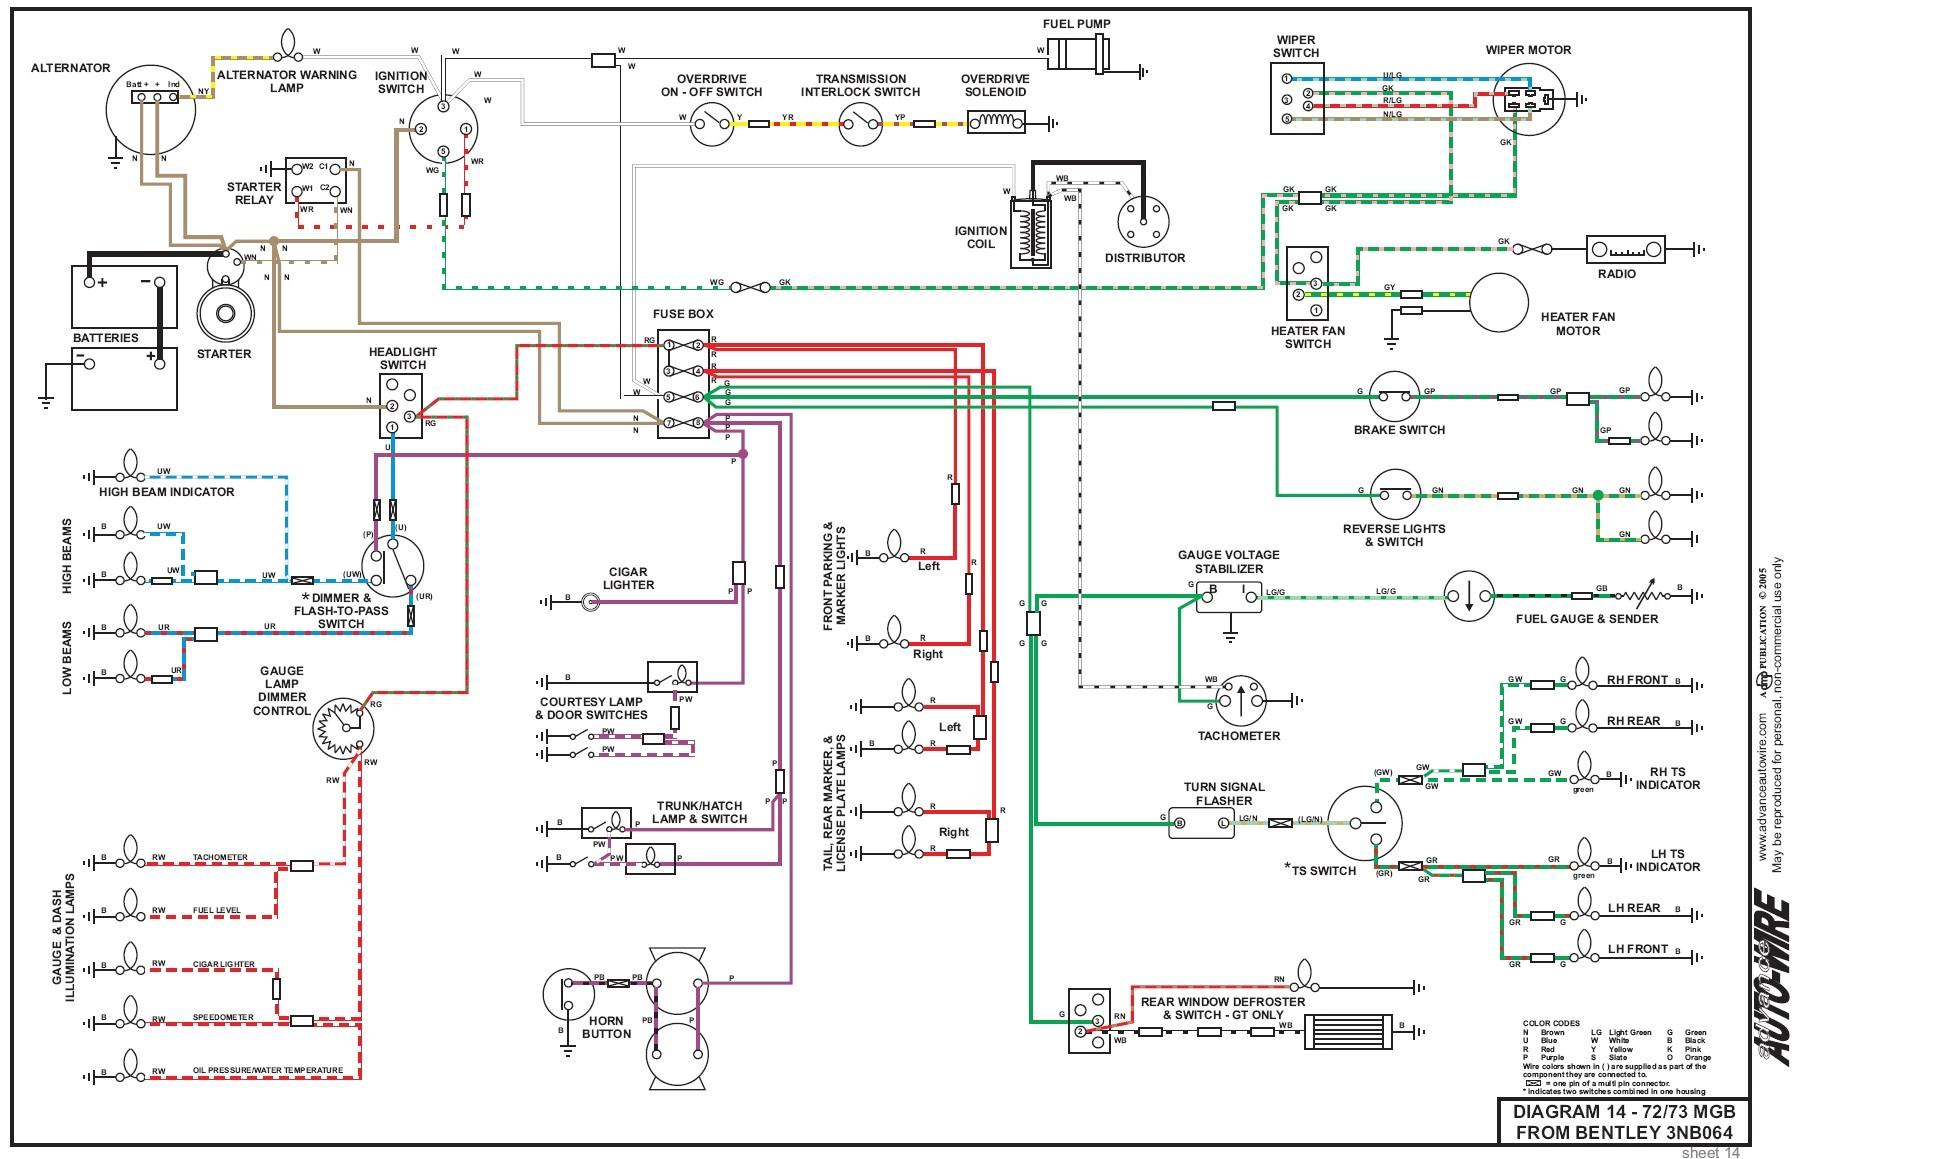 1975 mgb wiring question wiring diagram load 1980 mgb auto wiring related keywords suggestions 1980 mgb auto